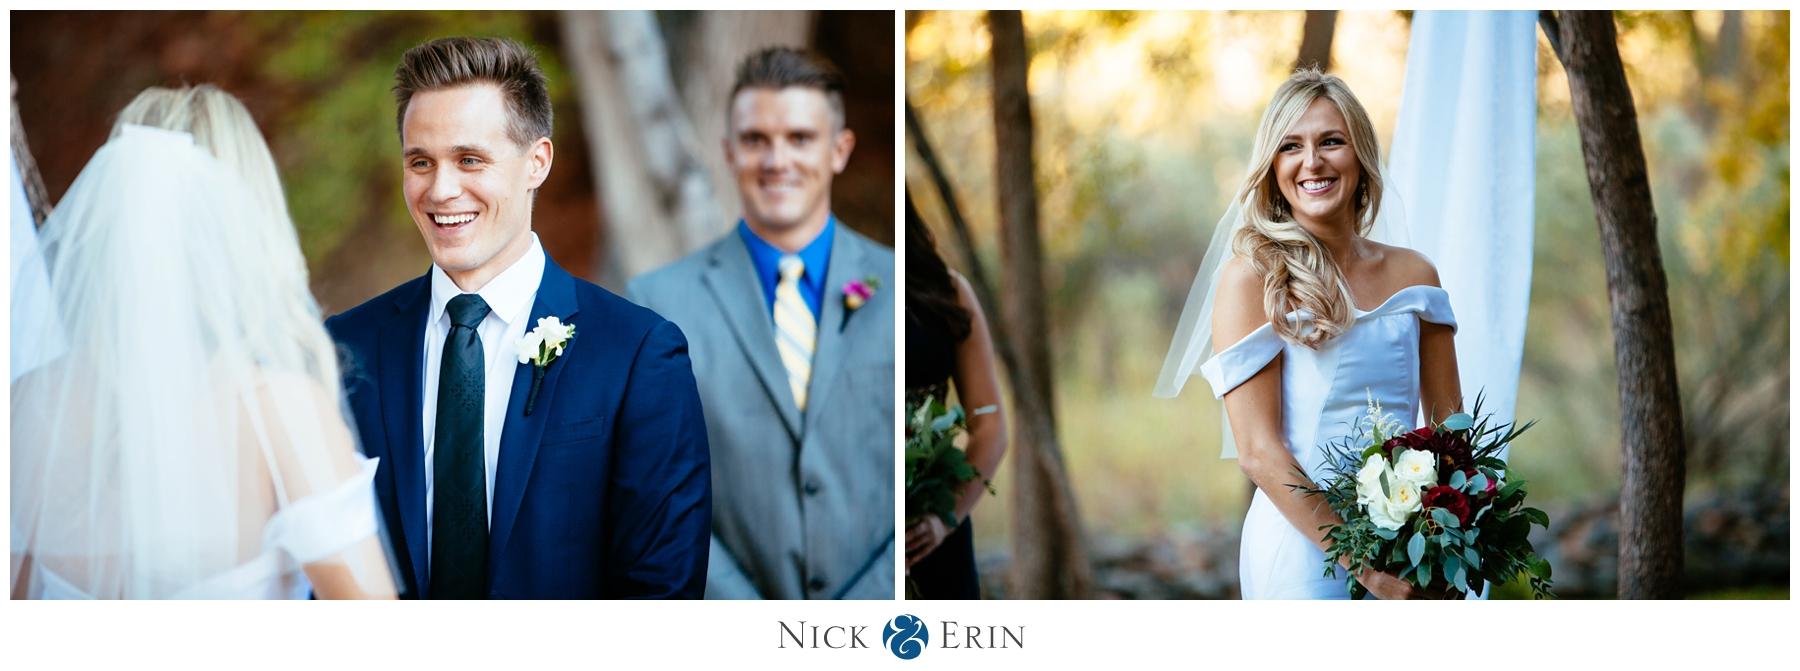 Donner_Photography_Sedona Arizona Wedding_Alissa and Tom_0042